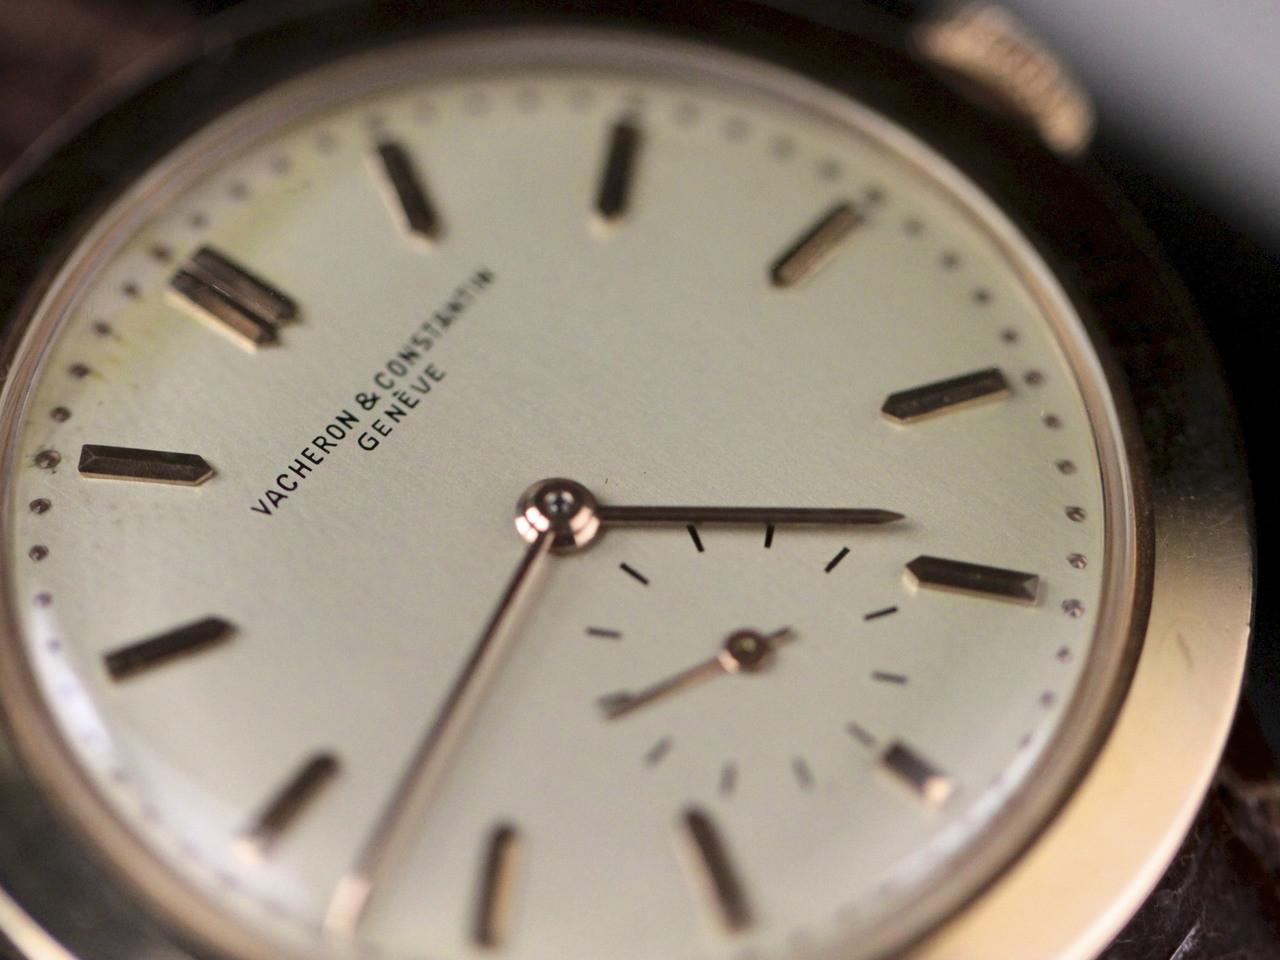 Dial Detail - Vintage Vacheron Constantin Vintage Gold Watch - www.Legendoftime.com - Chicago Watch Center